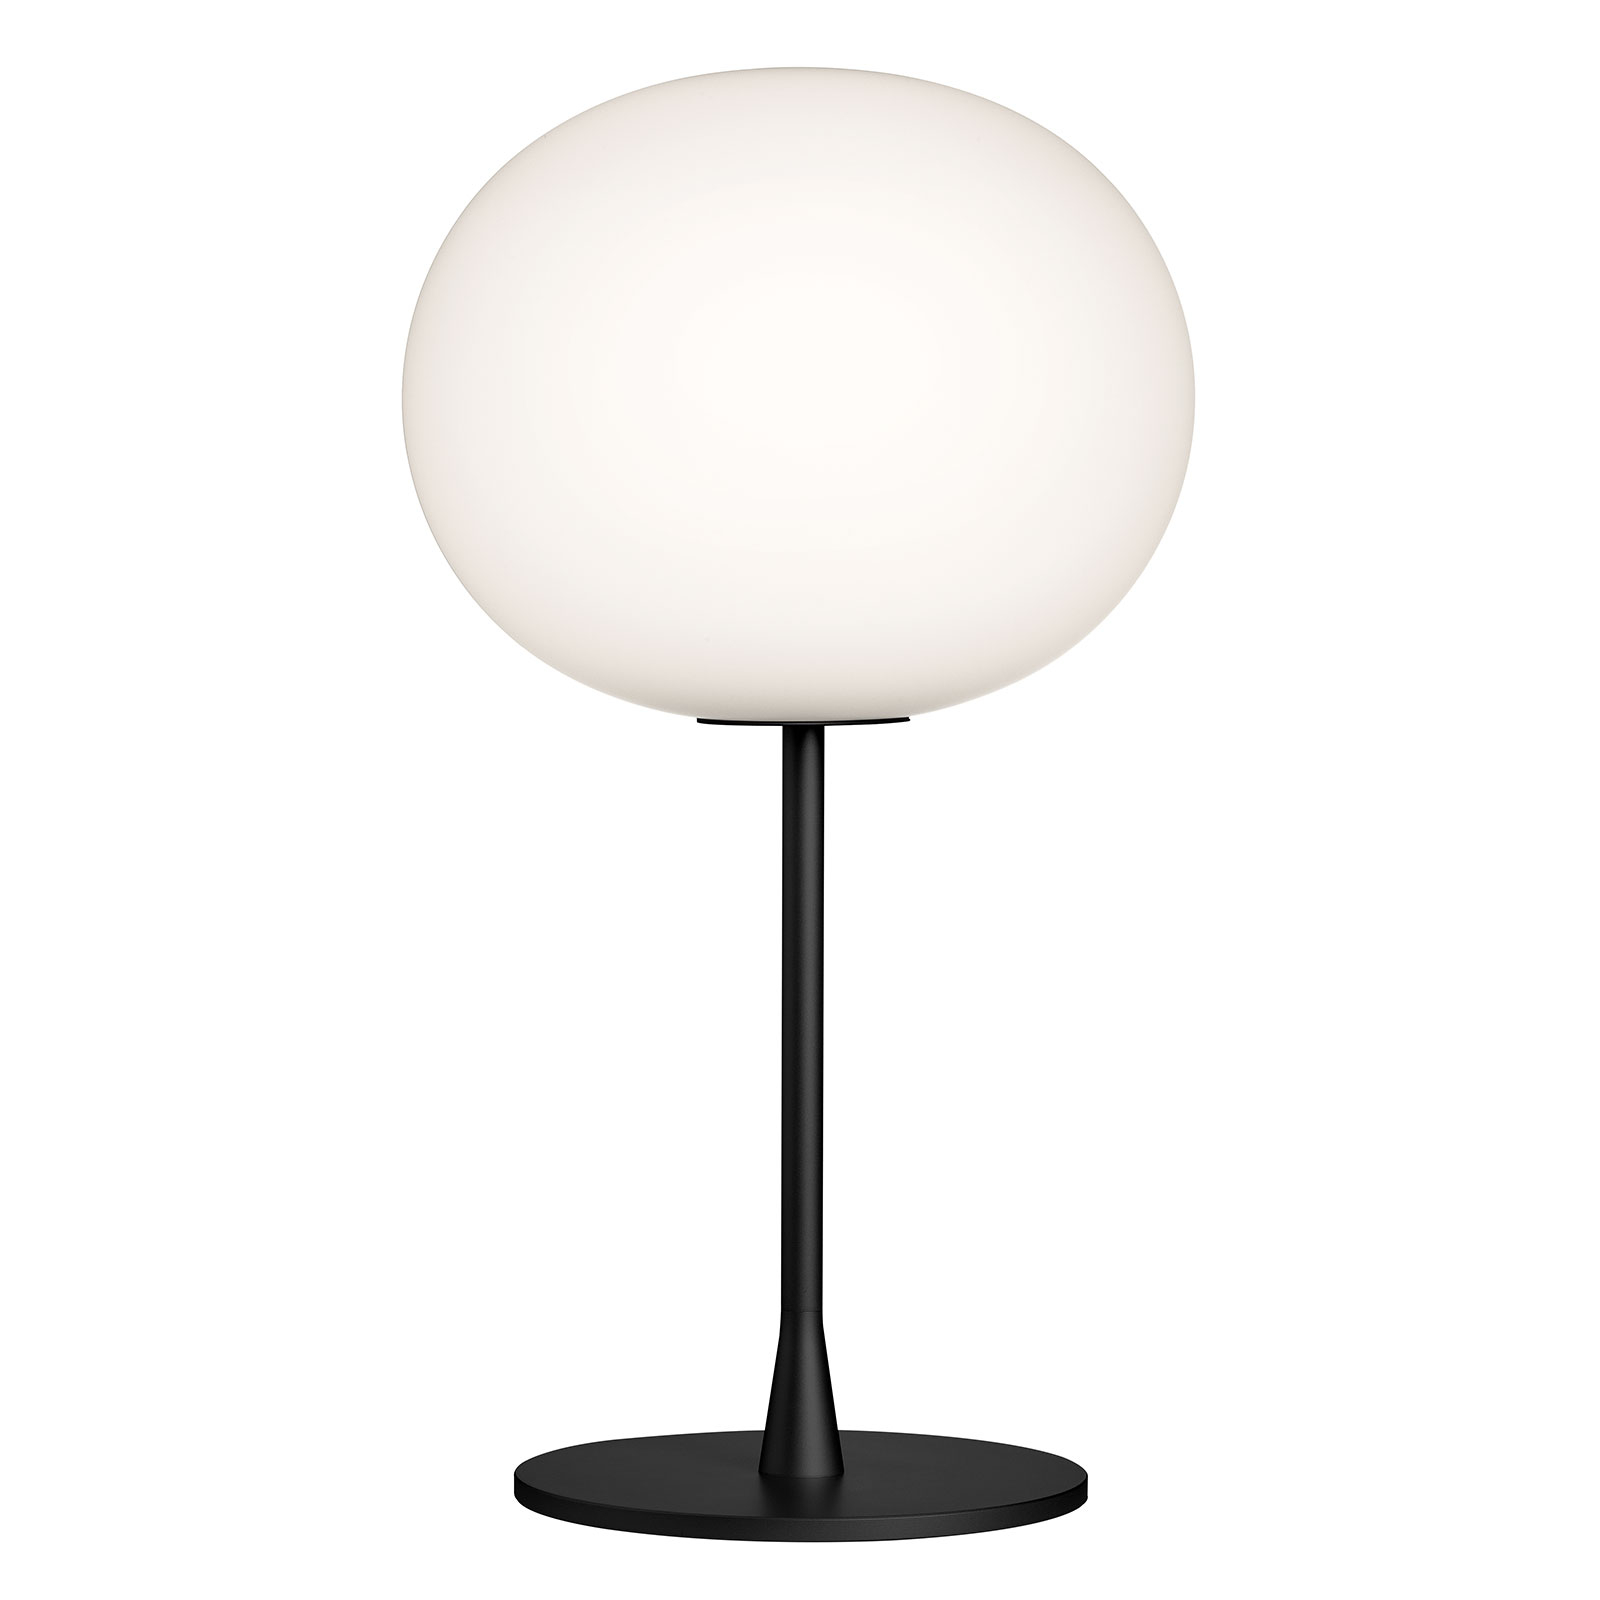 FLOS Glo-Ball T1 tafellamp, zwart